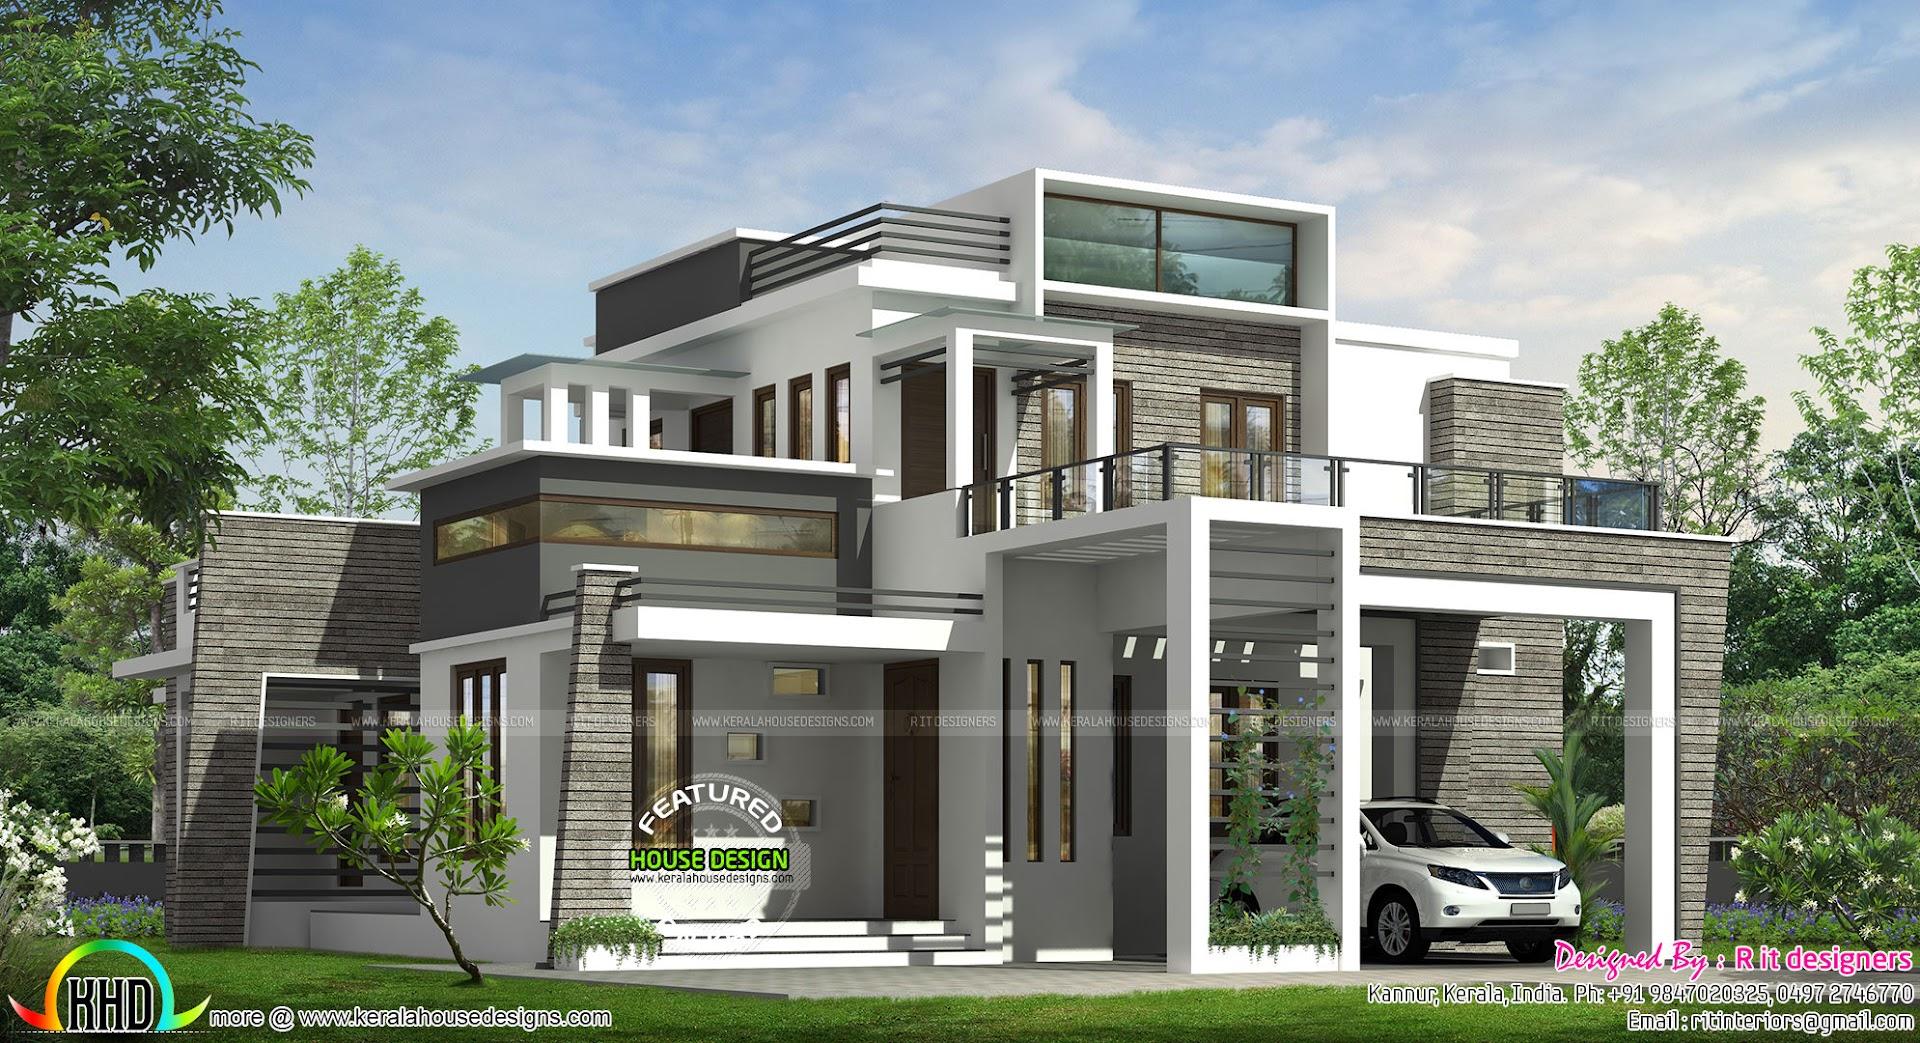 4 BHK modern box type house - Kerala home design and floor ...